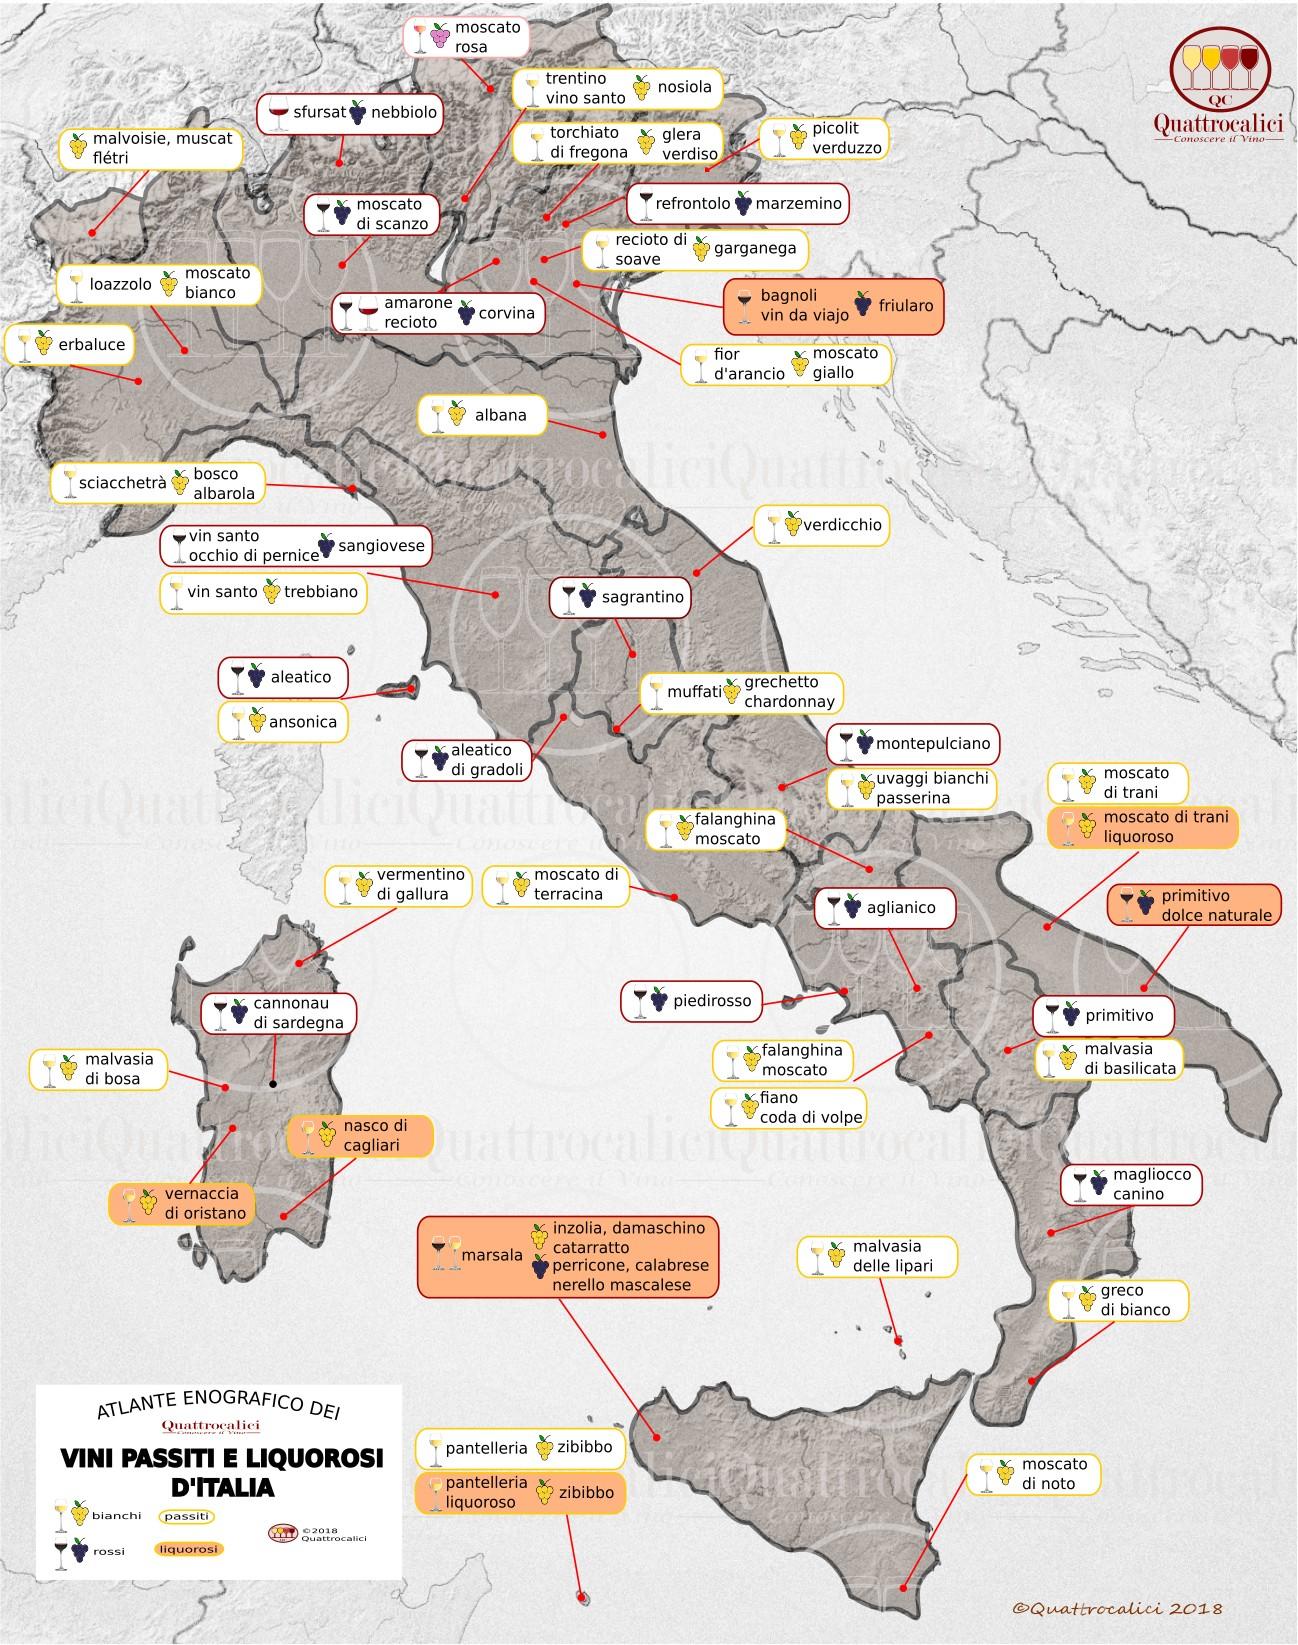 Cartina dei Vini Passiti e Liquorosi d'Italia